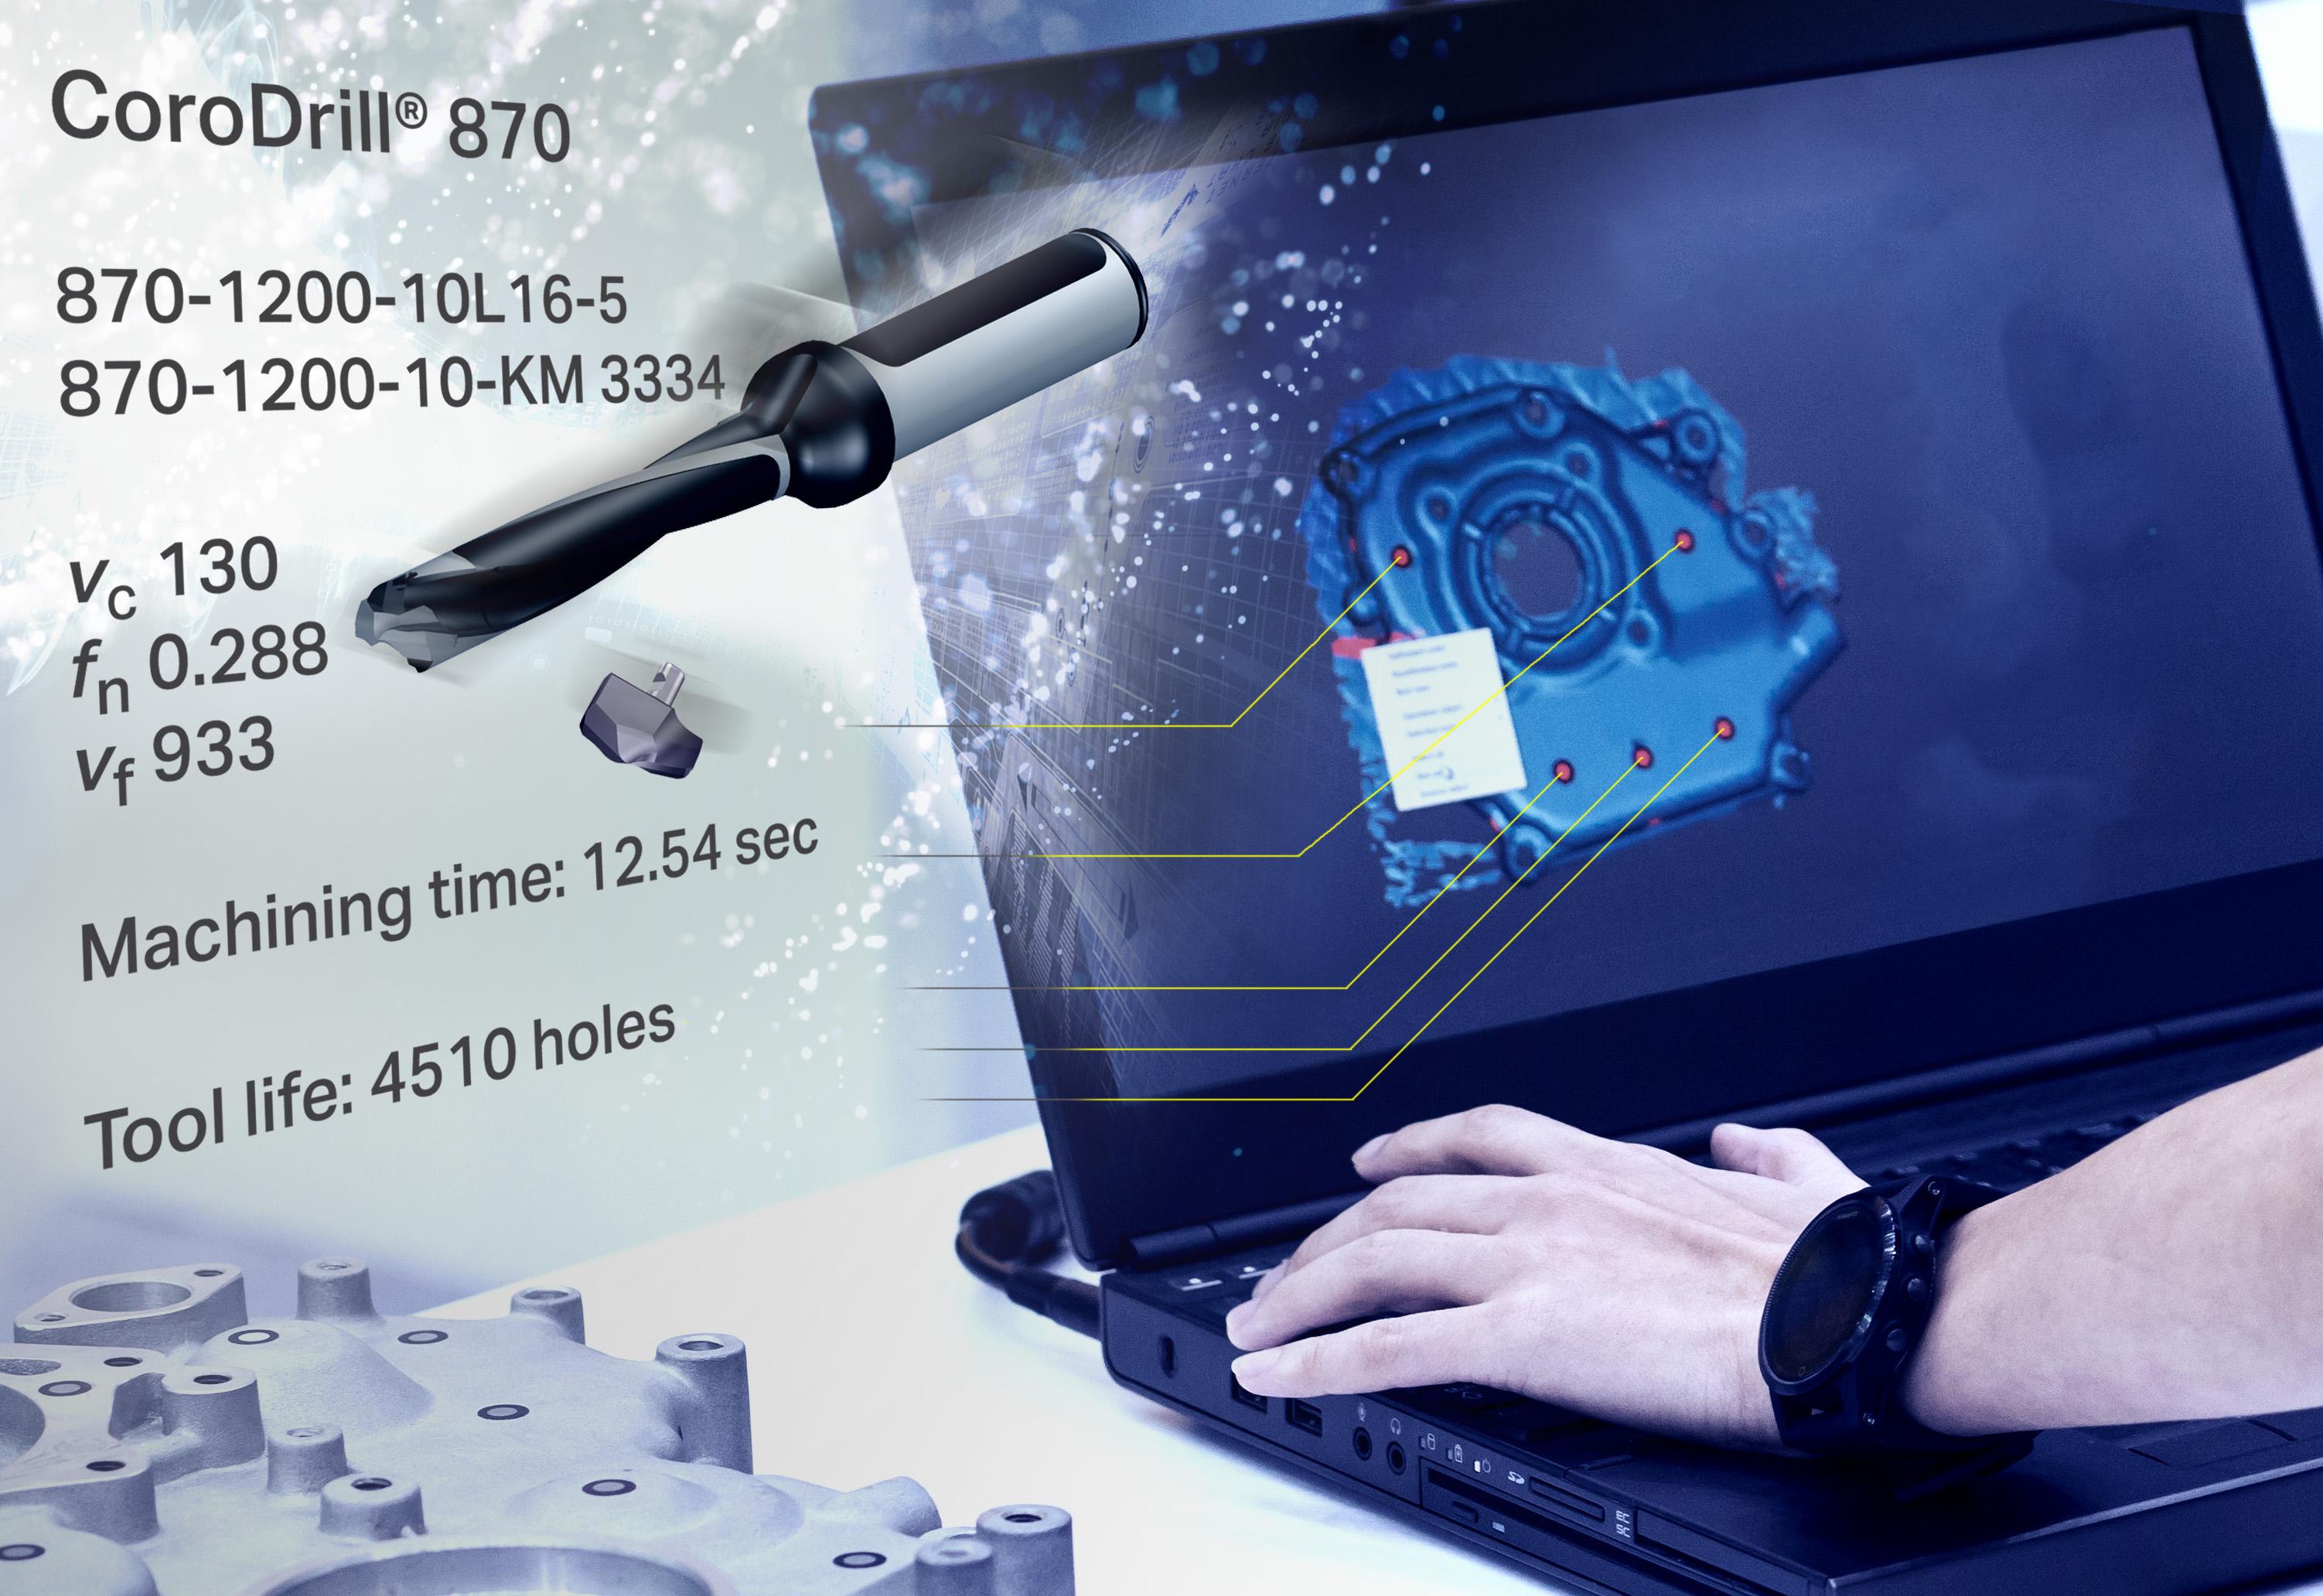 Sandvik Coromant has partnered with Autodesk to optimize the developer's Fusion 360 software package for 3D printing tools. Image via Sandvik Coromant.